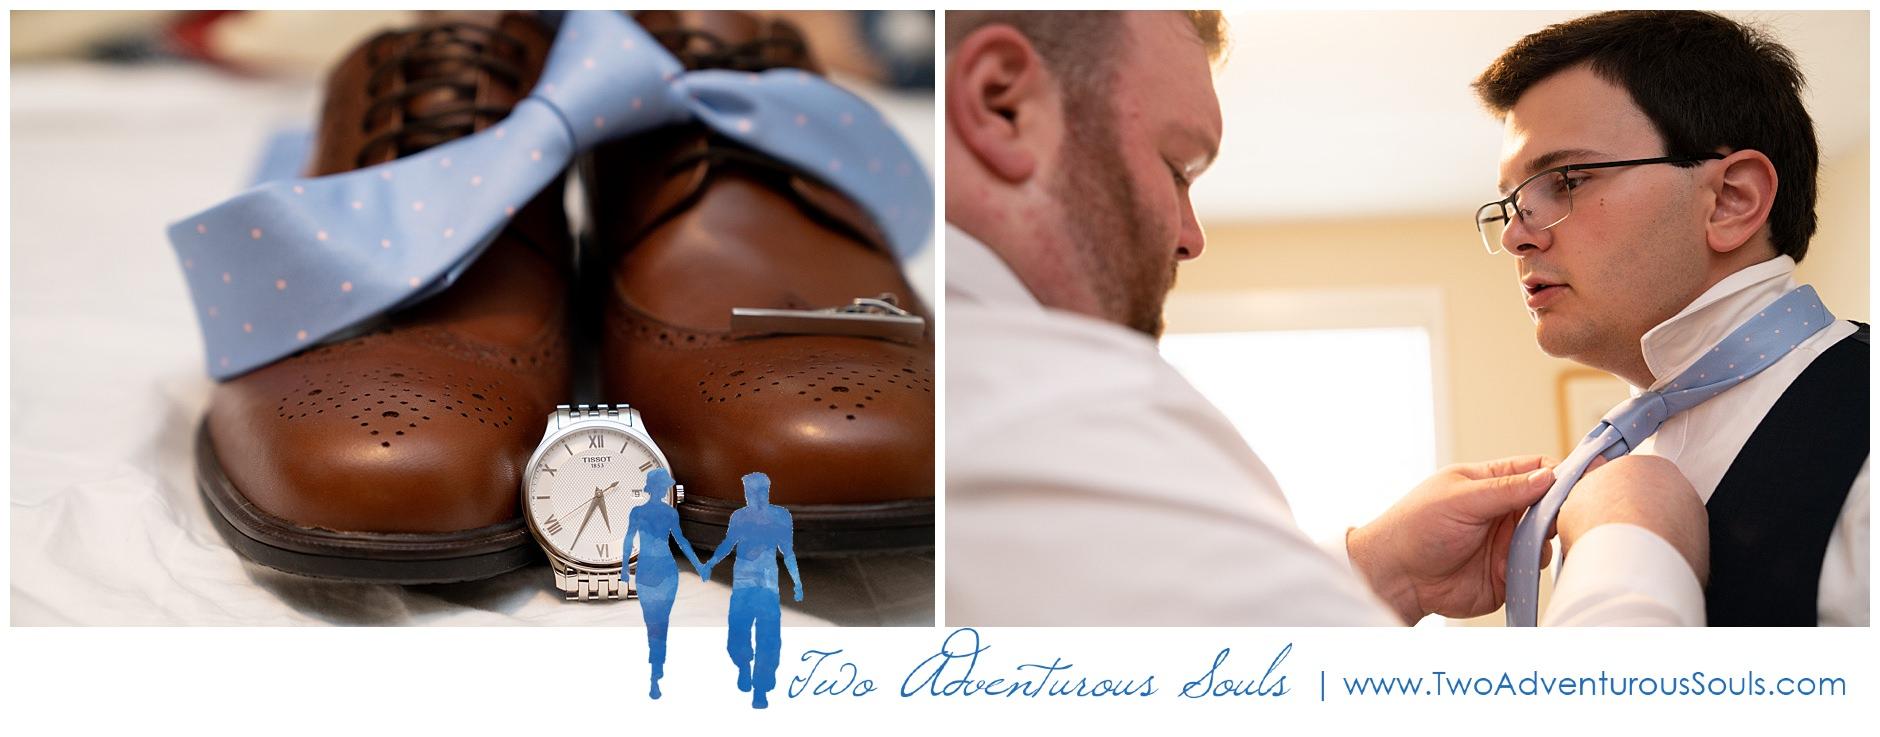 Cape Cod Wedding Photographers, Destination Wedding Photographers, Two Adventurous Souls-081019_0001.jpg